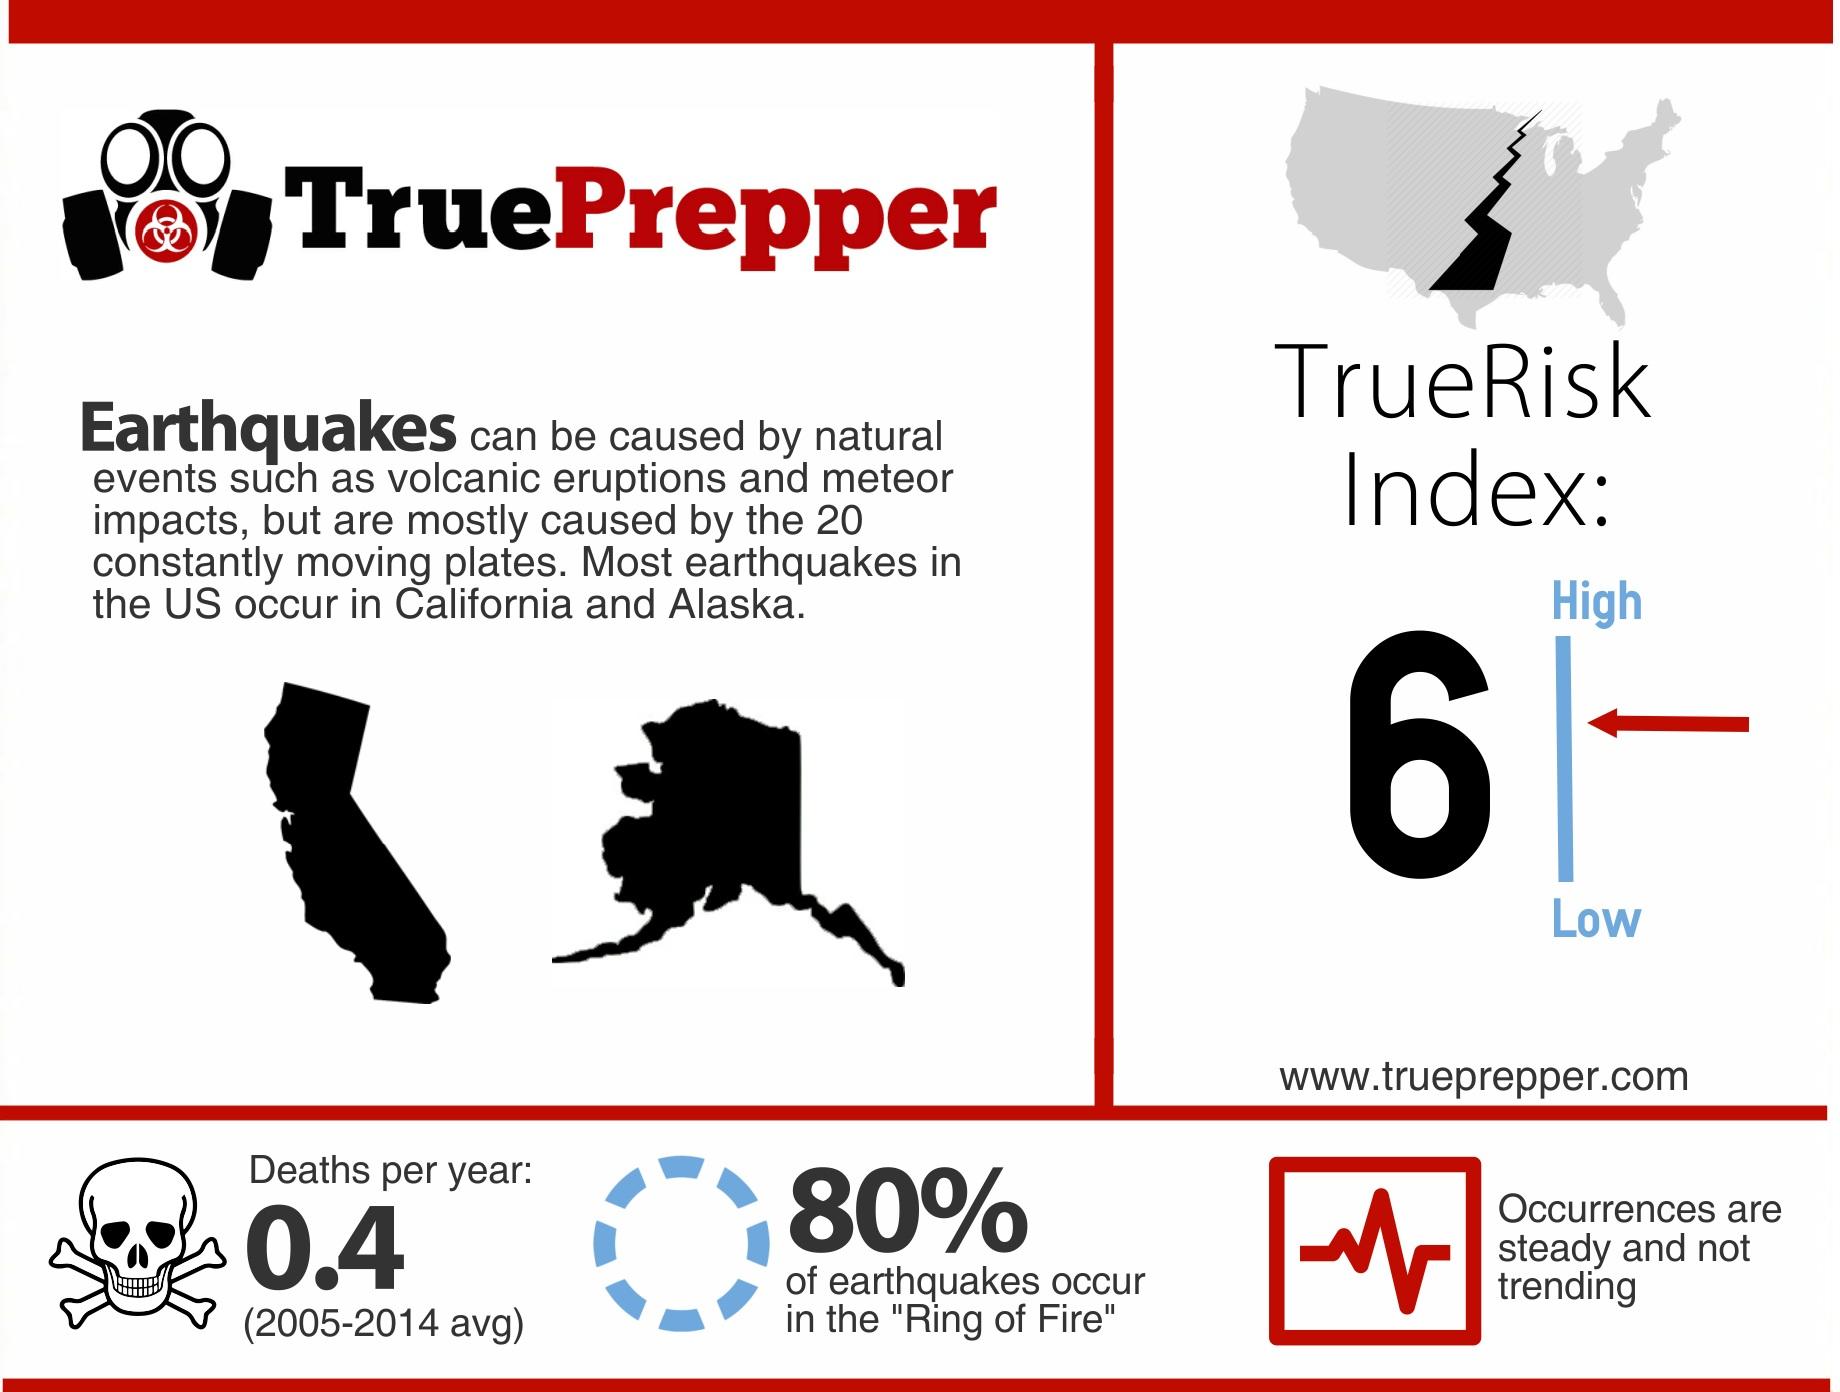 TrueRisk Earthquakes